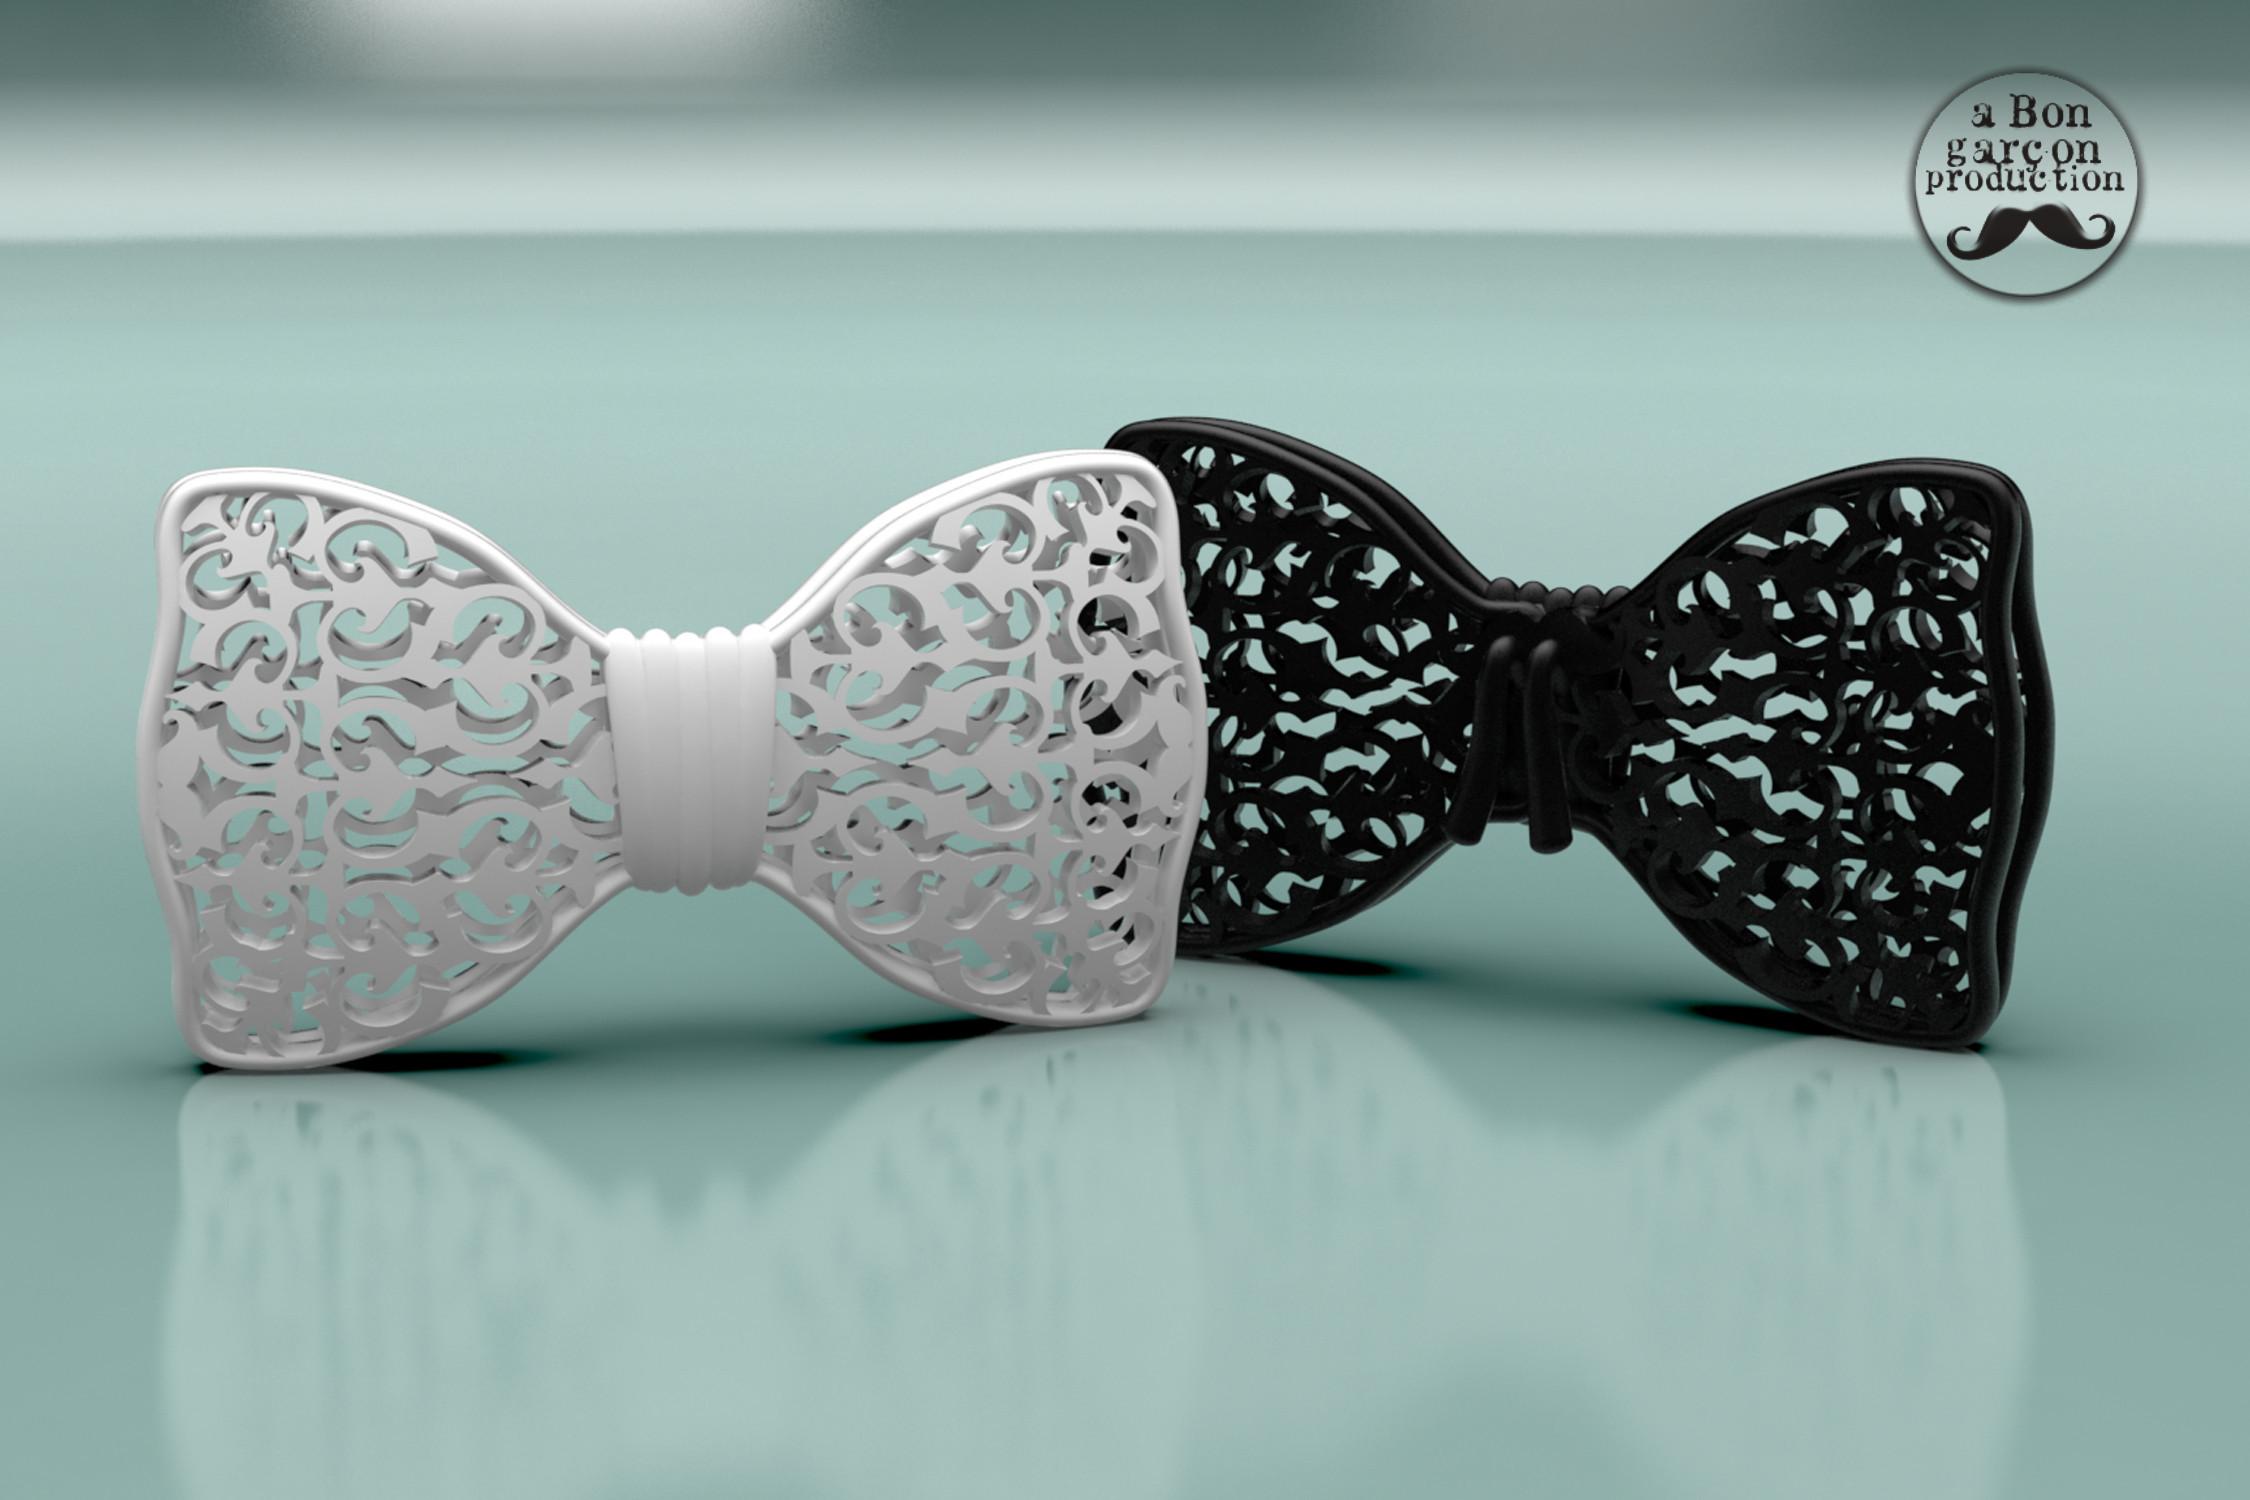 Bon_Garcon_BowTie_02.jpg Download free STL file Fancy Bow Tie VERSION ONE • 3D printing design, BonGarcon